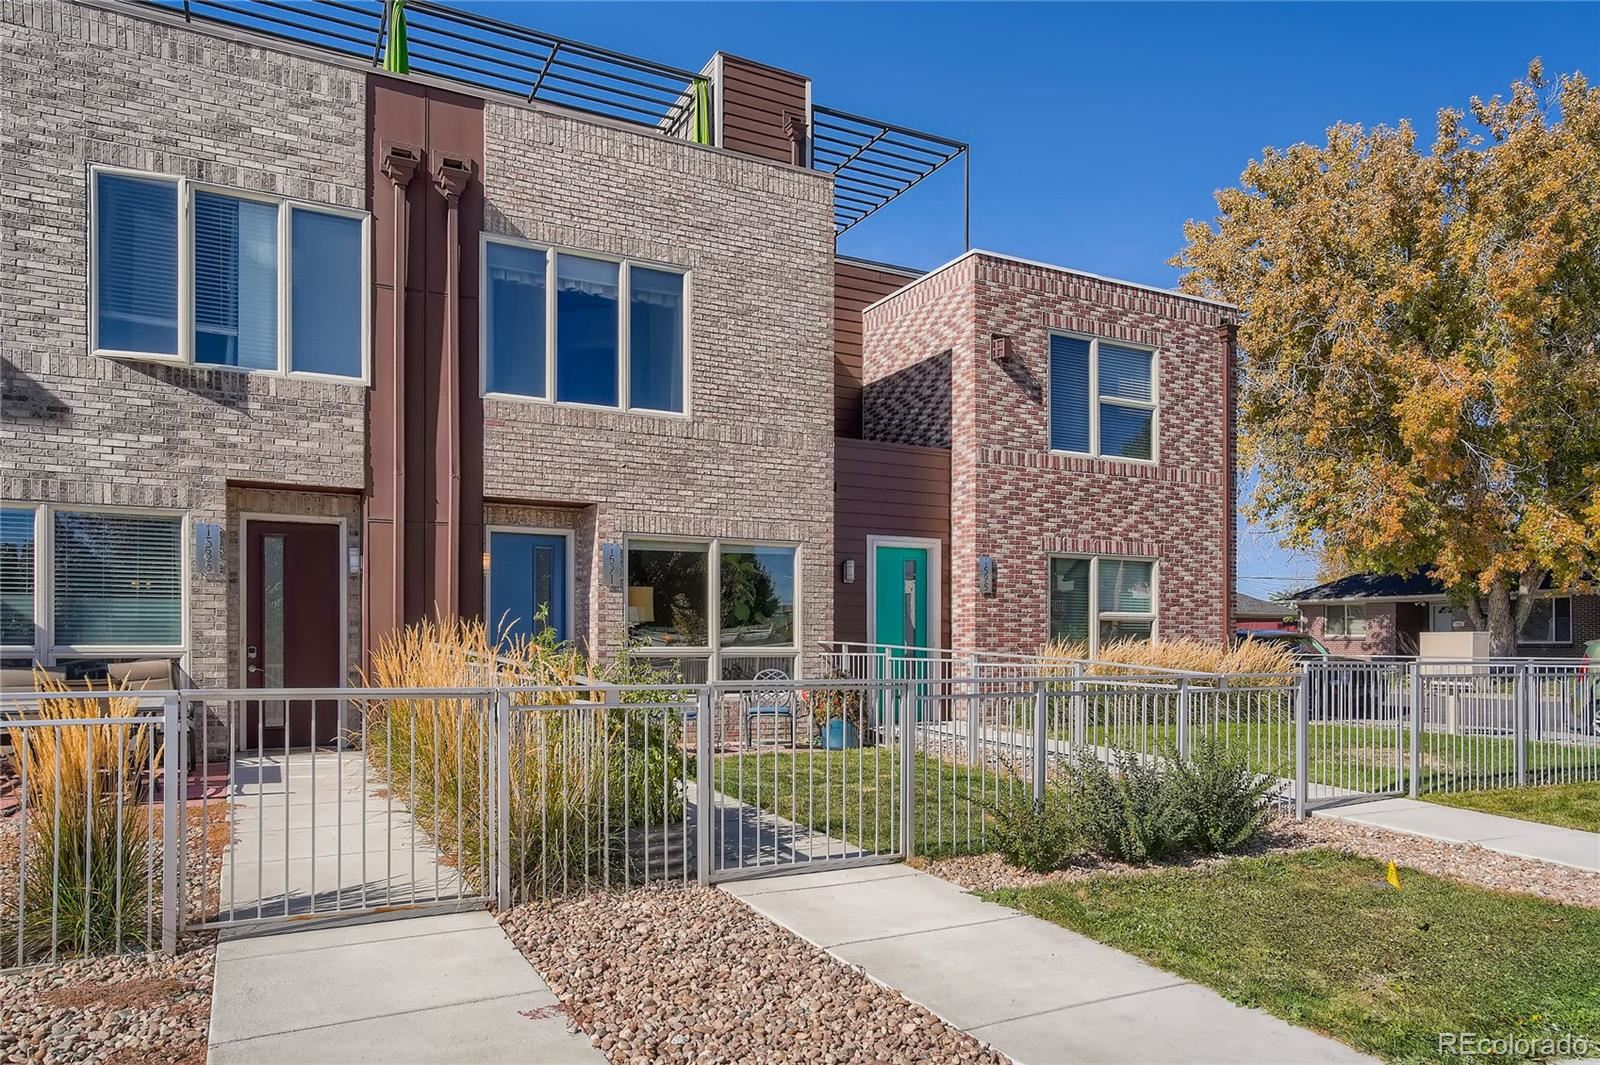 Photo of 1591 Wolff Street, Denver, CO 80204 (MLS # 7895792)